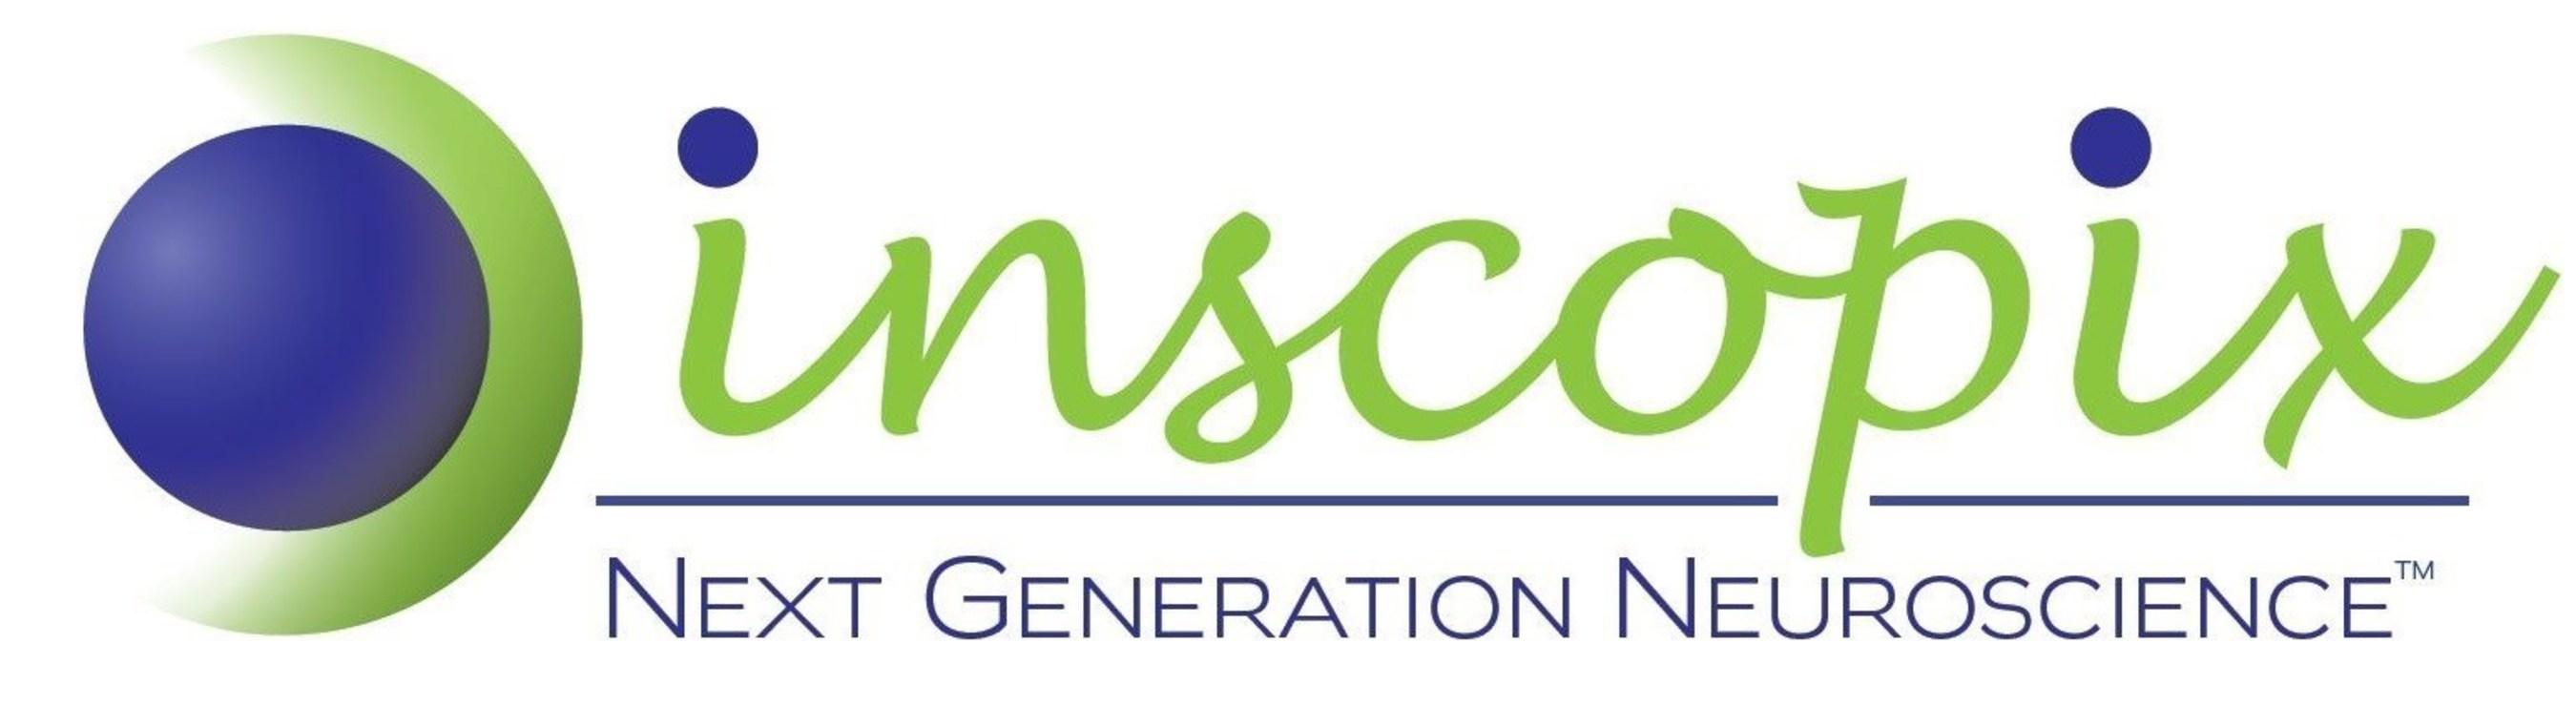 "Inscopix Launches ""Thousand Neurons"" Technology Subscription Program"